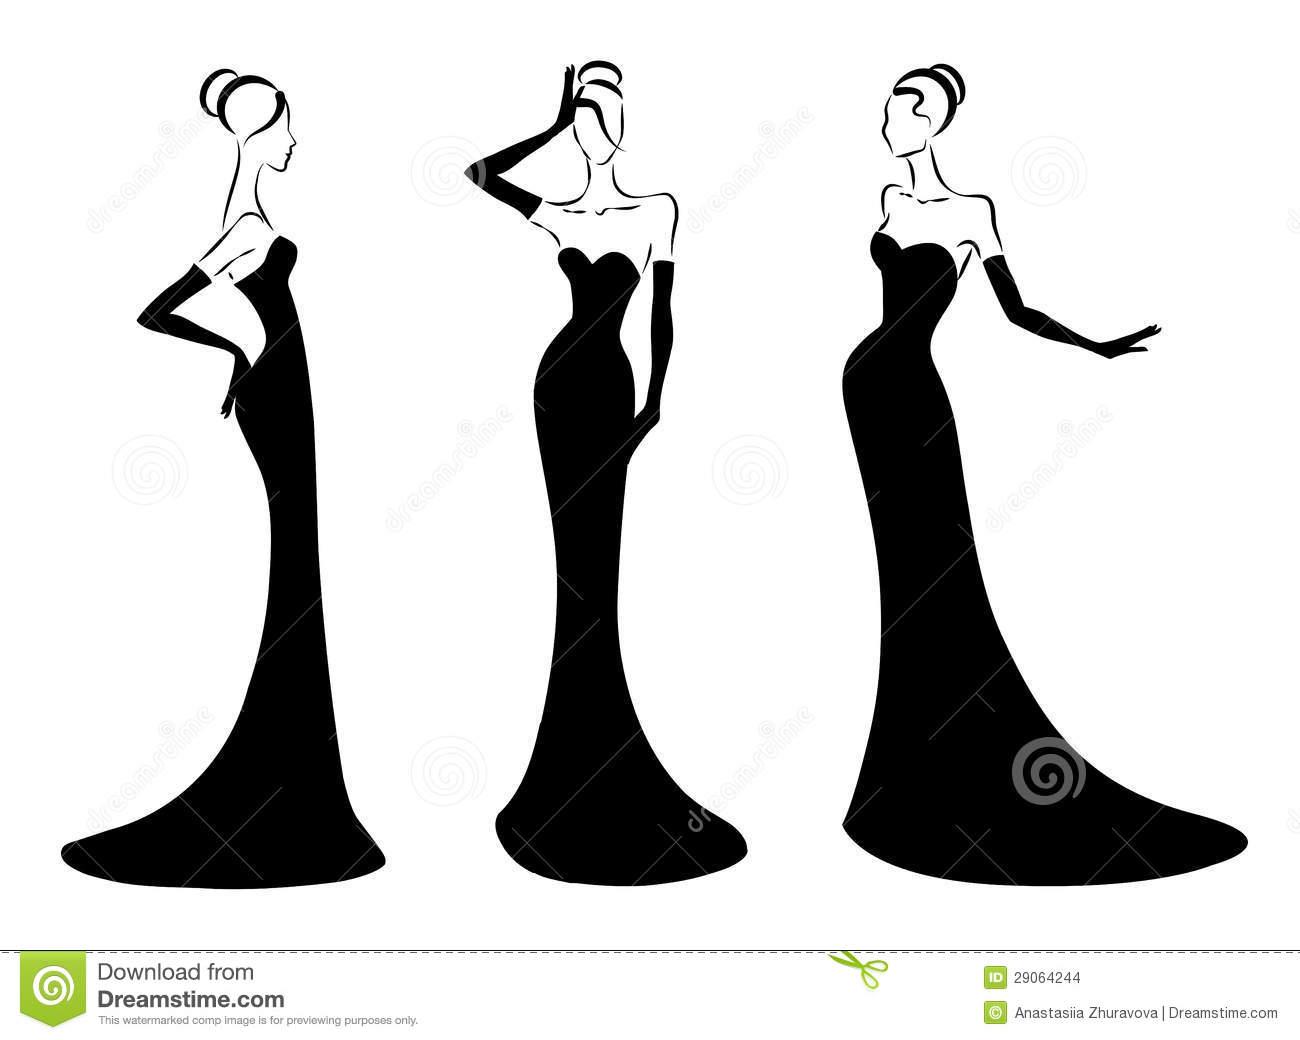 Elegant girl clipart - ClipartFest black and white library